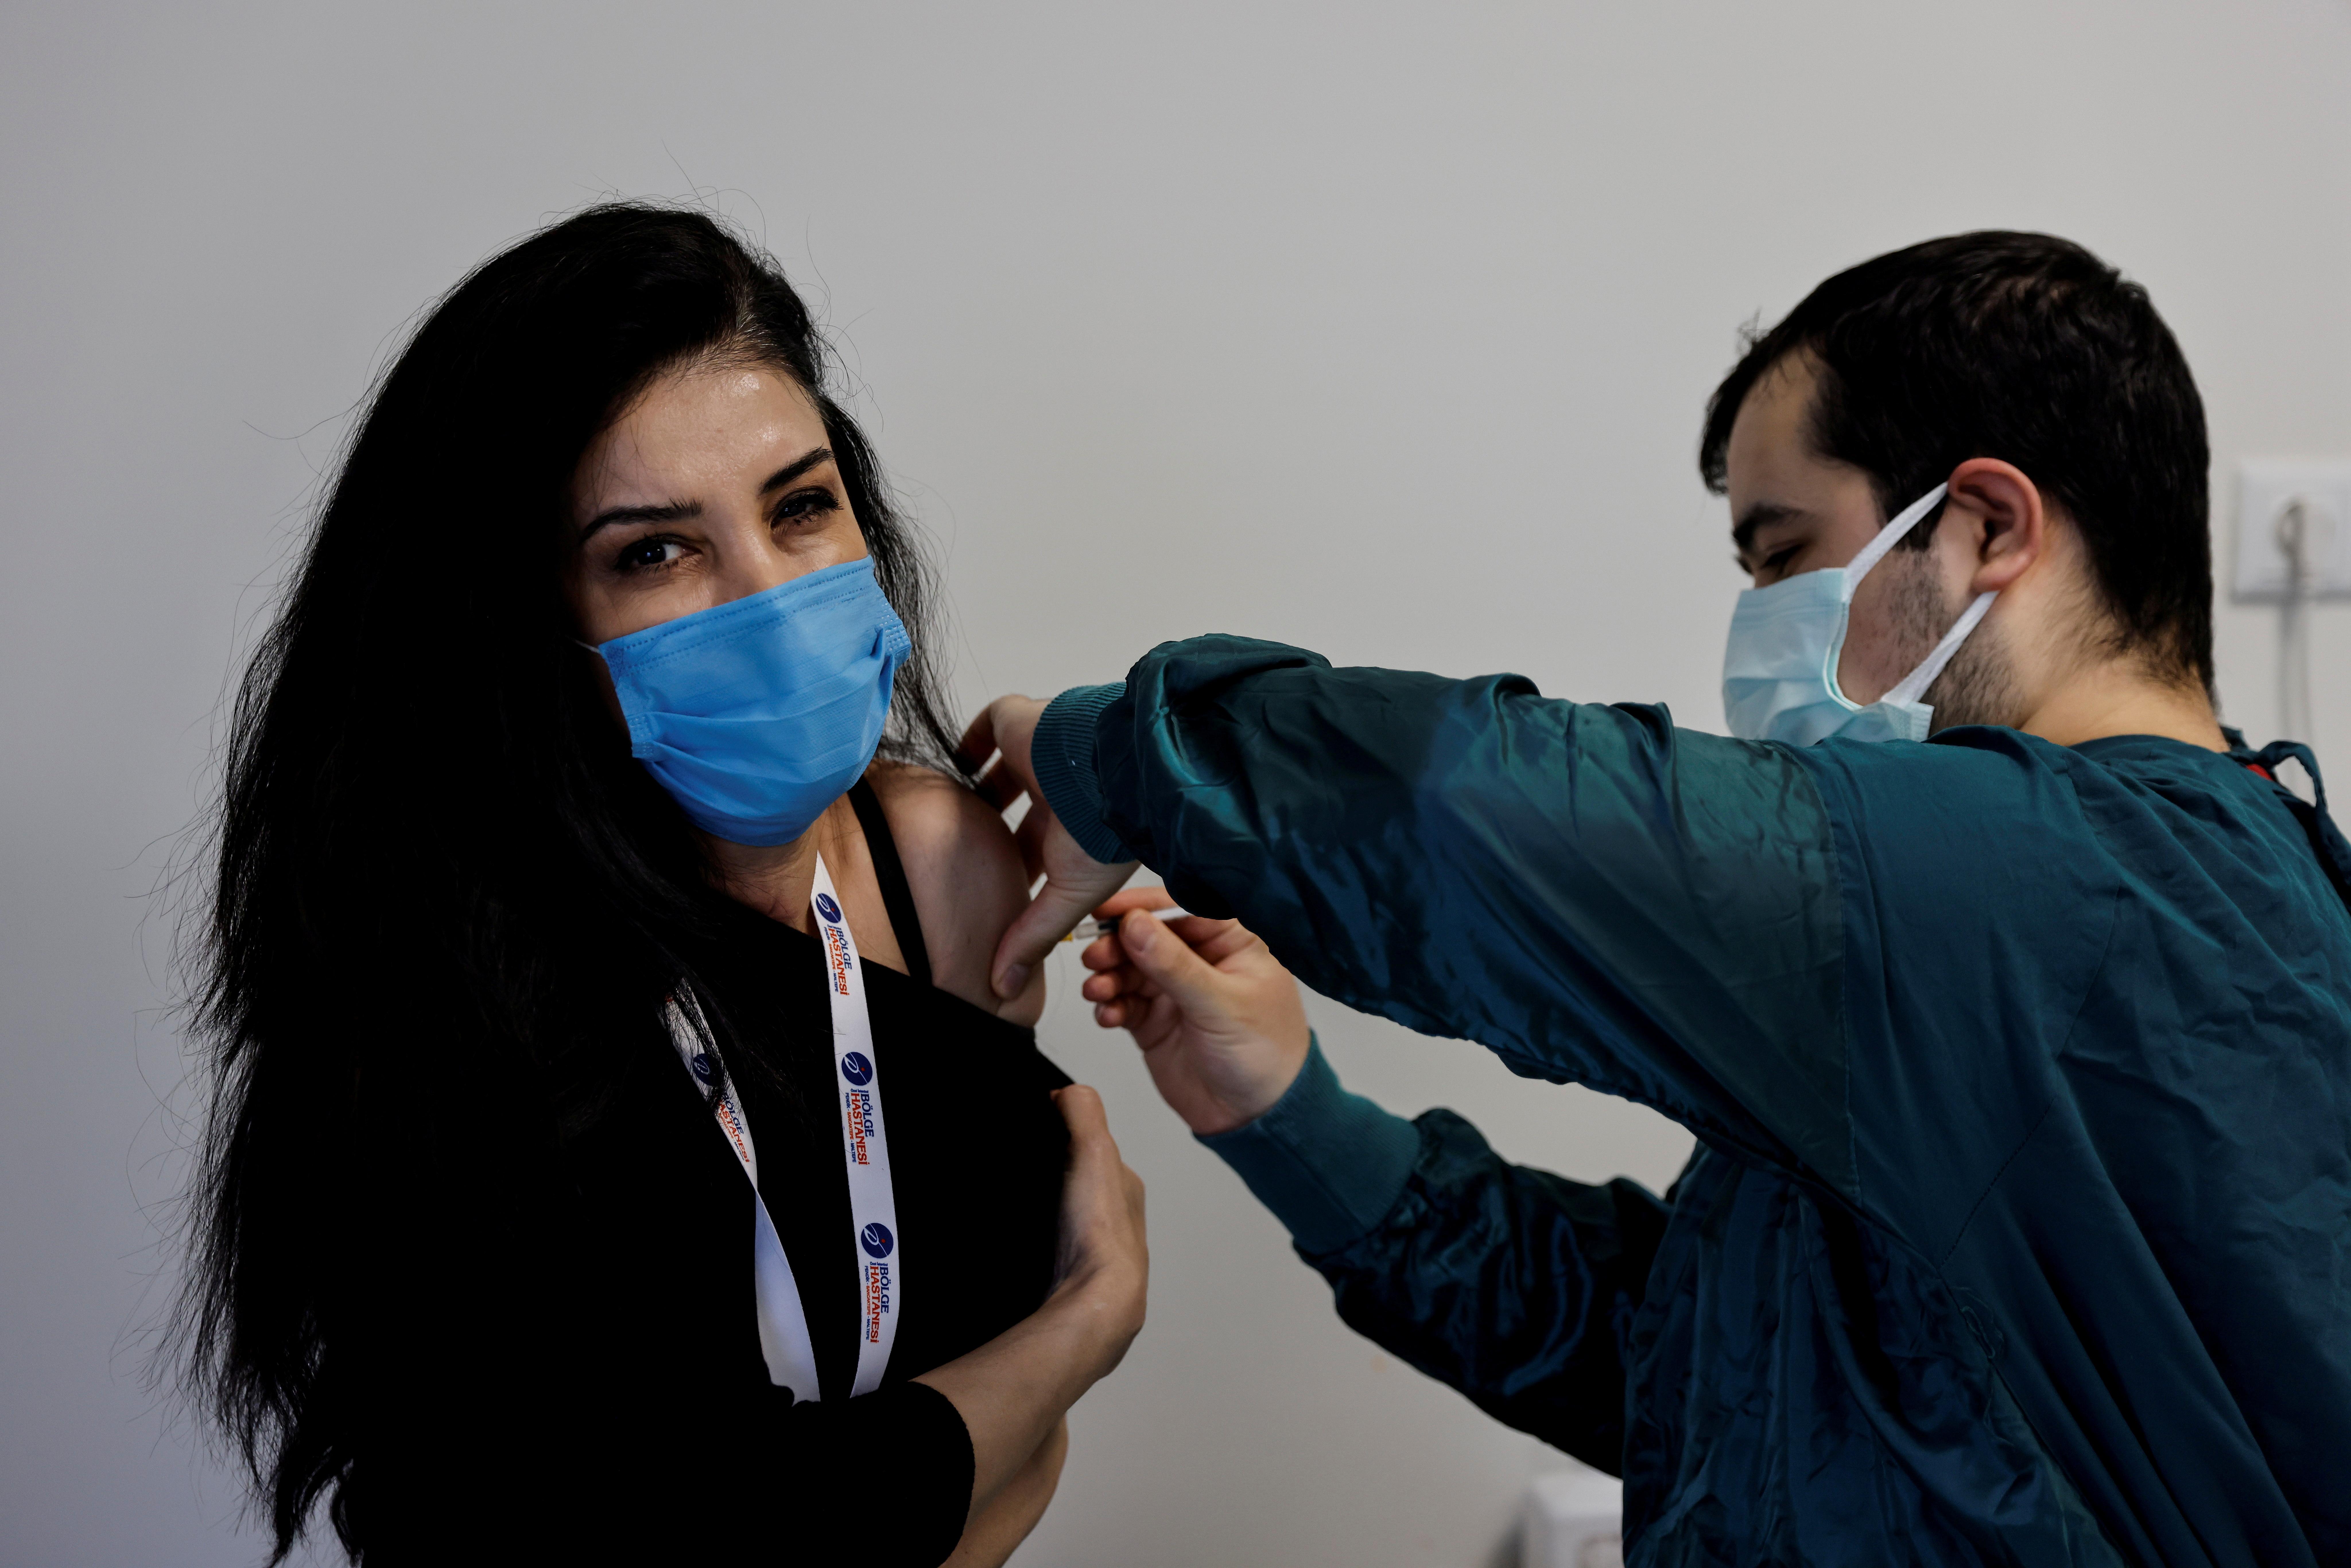 Senay Salman receives a shot of the Pfizer-BioNTech coronavirus disease (COVID-19) vaccine at Dr. Feriha Oz Emergency Hospital in Istanbul, Turkey, April 9, 2021. REUTERS/Umit Bektas/File Photo